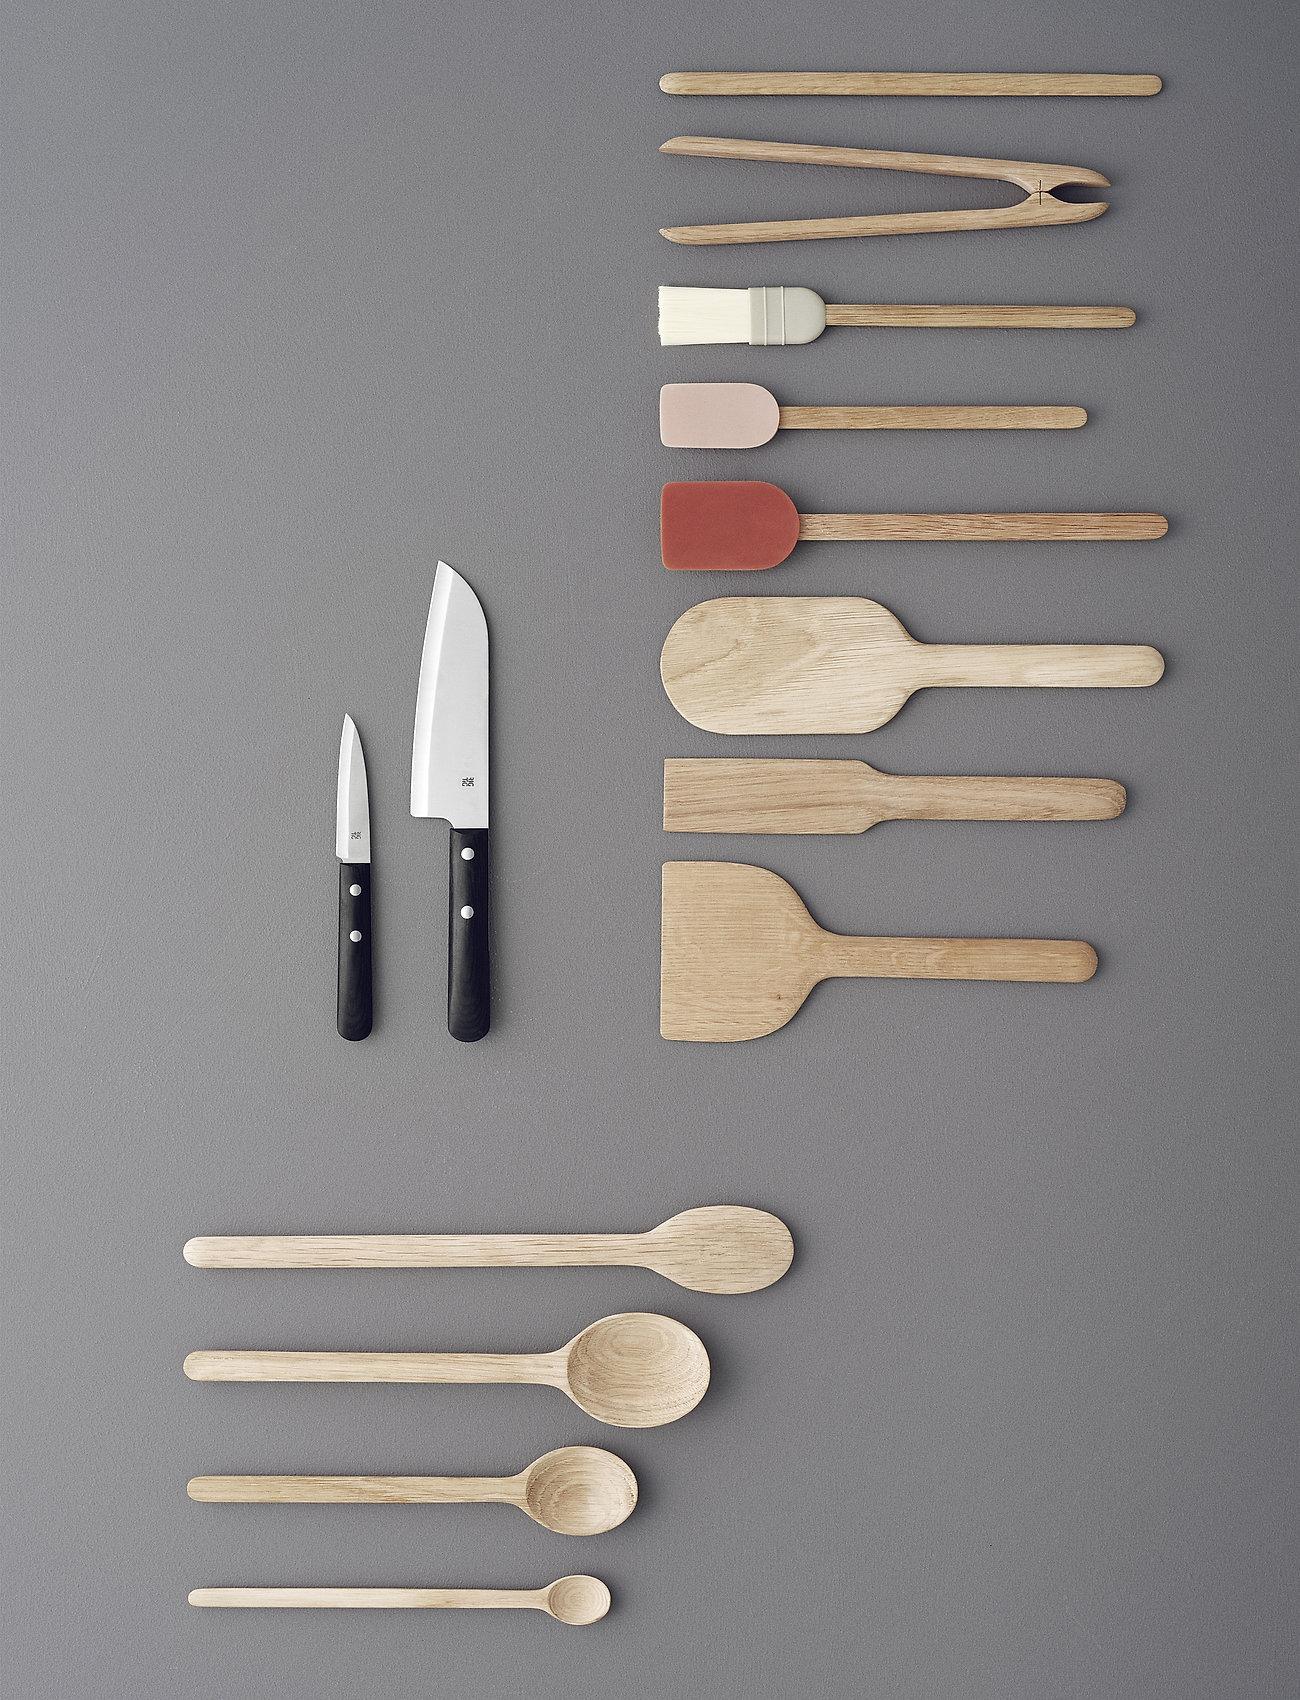 RIG-TIG - EASY scramble spatula - lusikat & kauhat - wood - 1